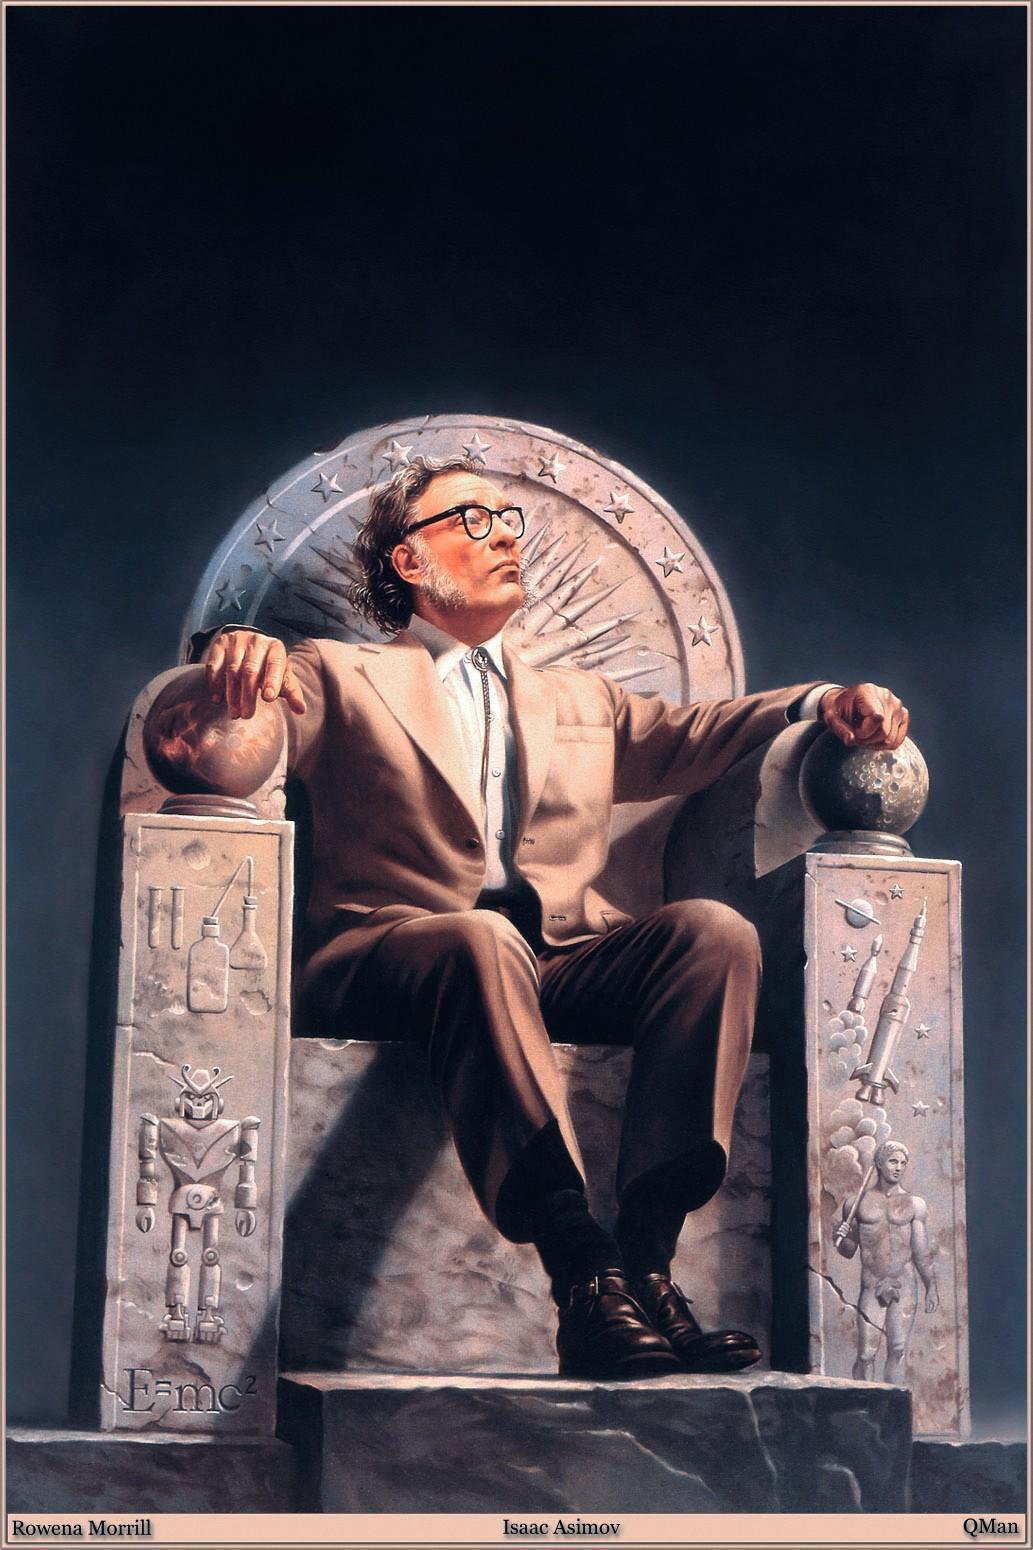 Isaac Asimov, 1970.